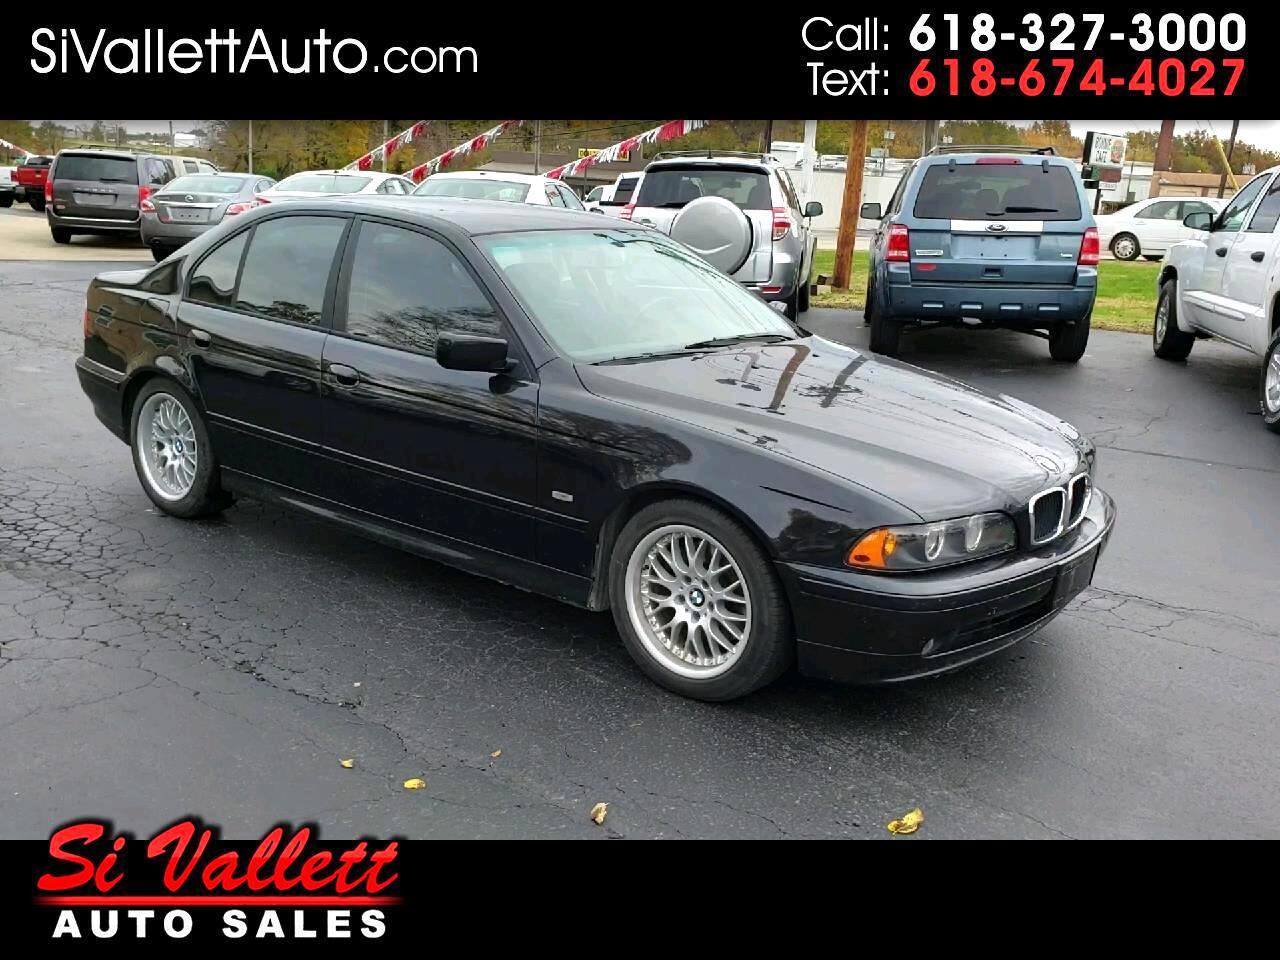 2001 BMW 5 Series 530i 4dr Sdn 5-Spd Manual